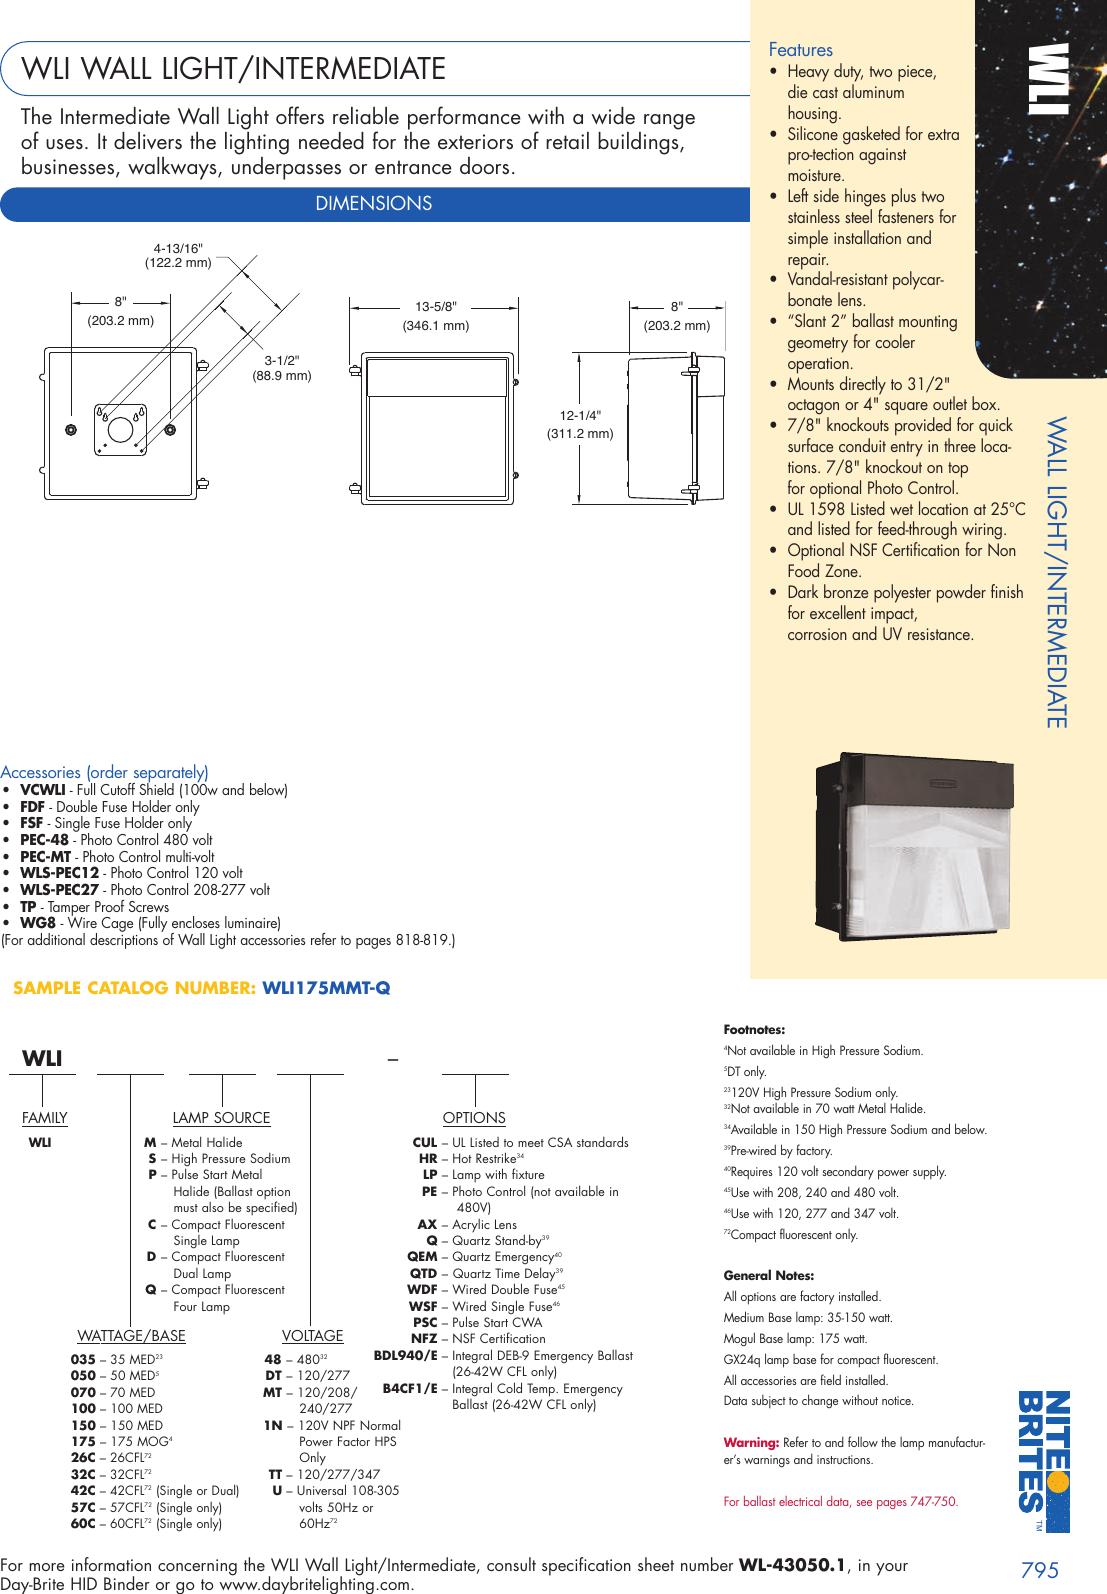 347 Volt Hid Ballast Wiring Diagram - Wiring Diagram Networks